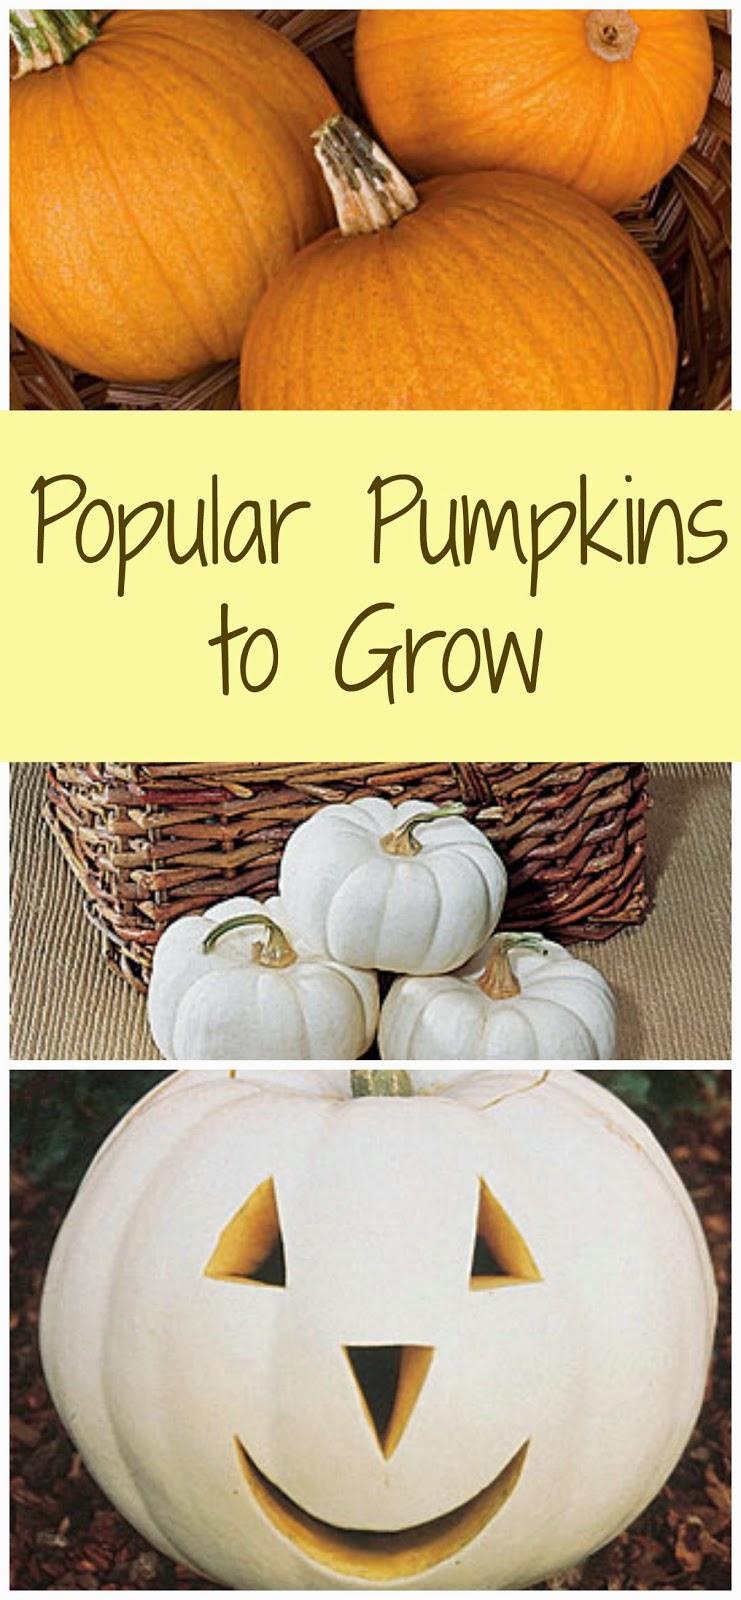 for Best pumpkins to grow